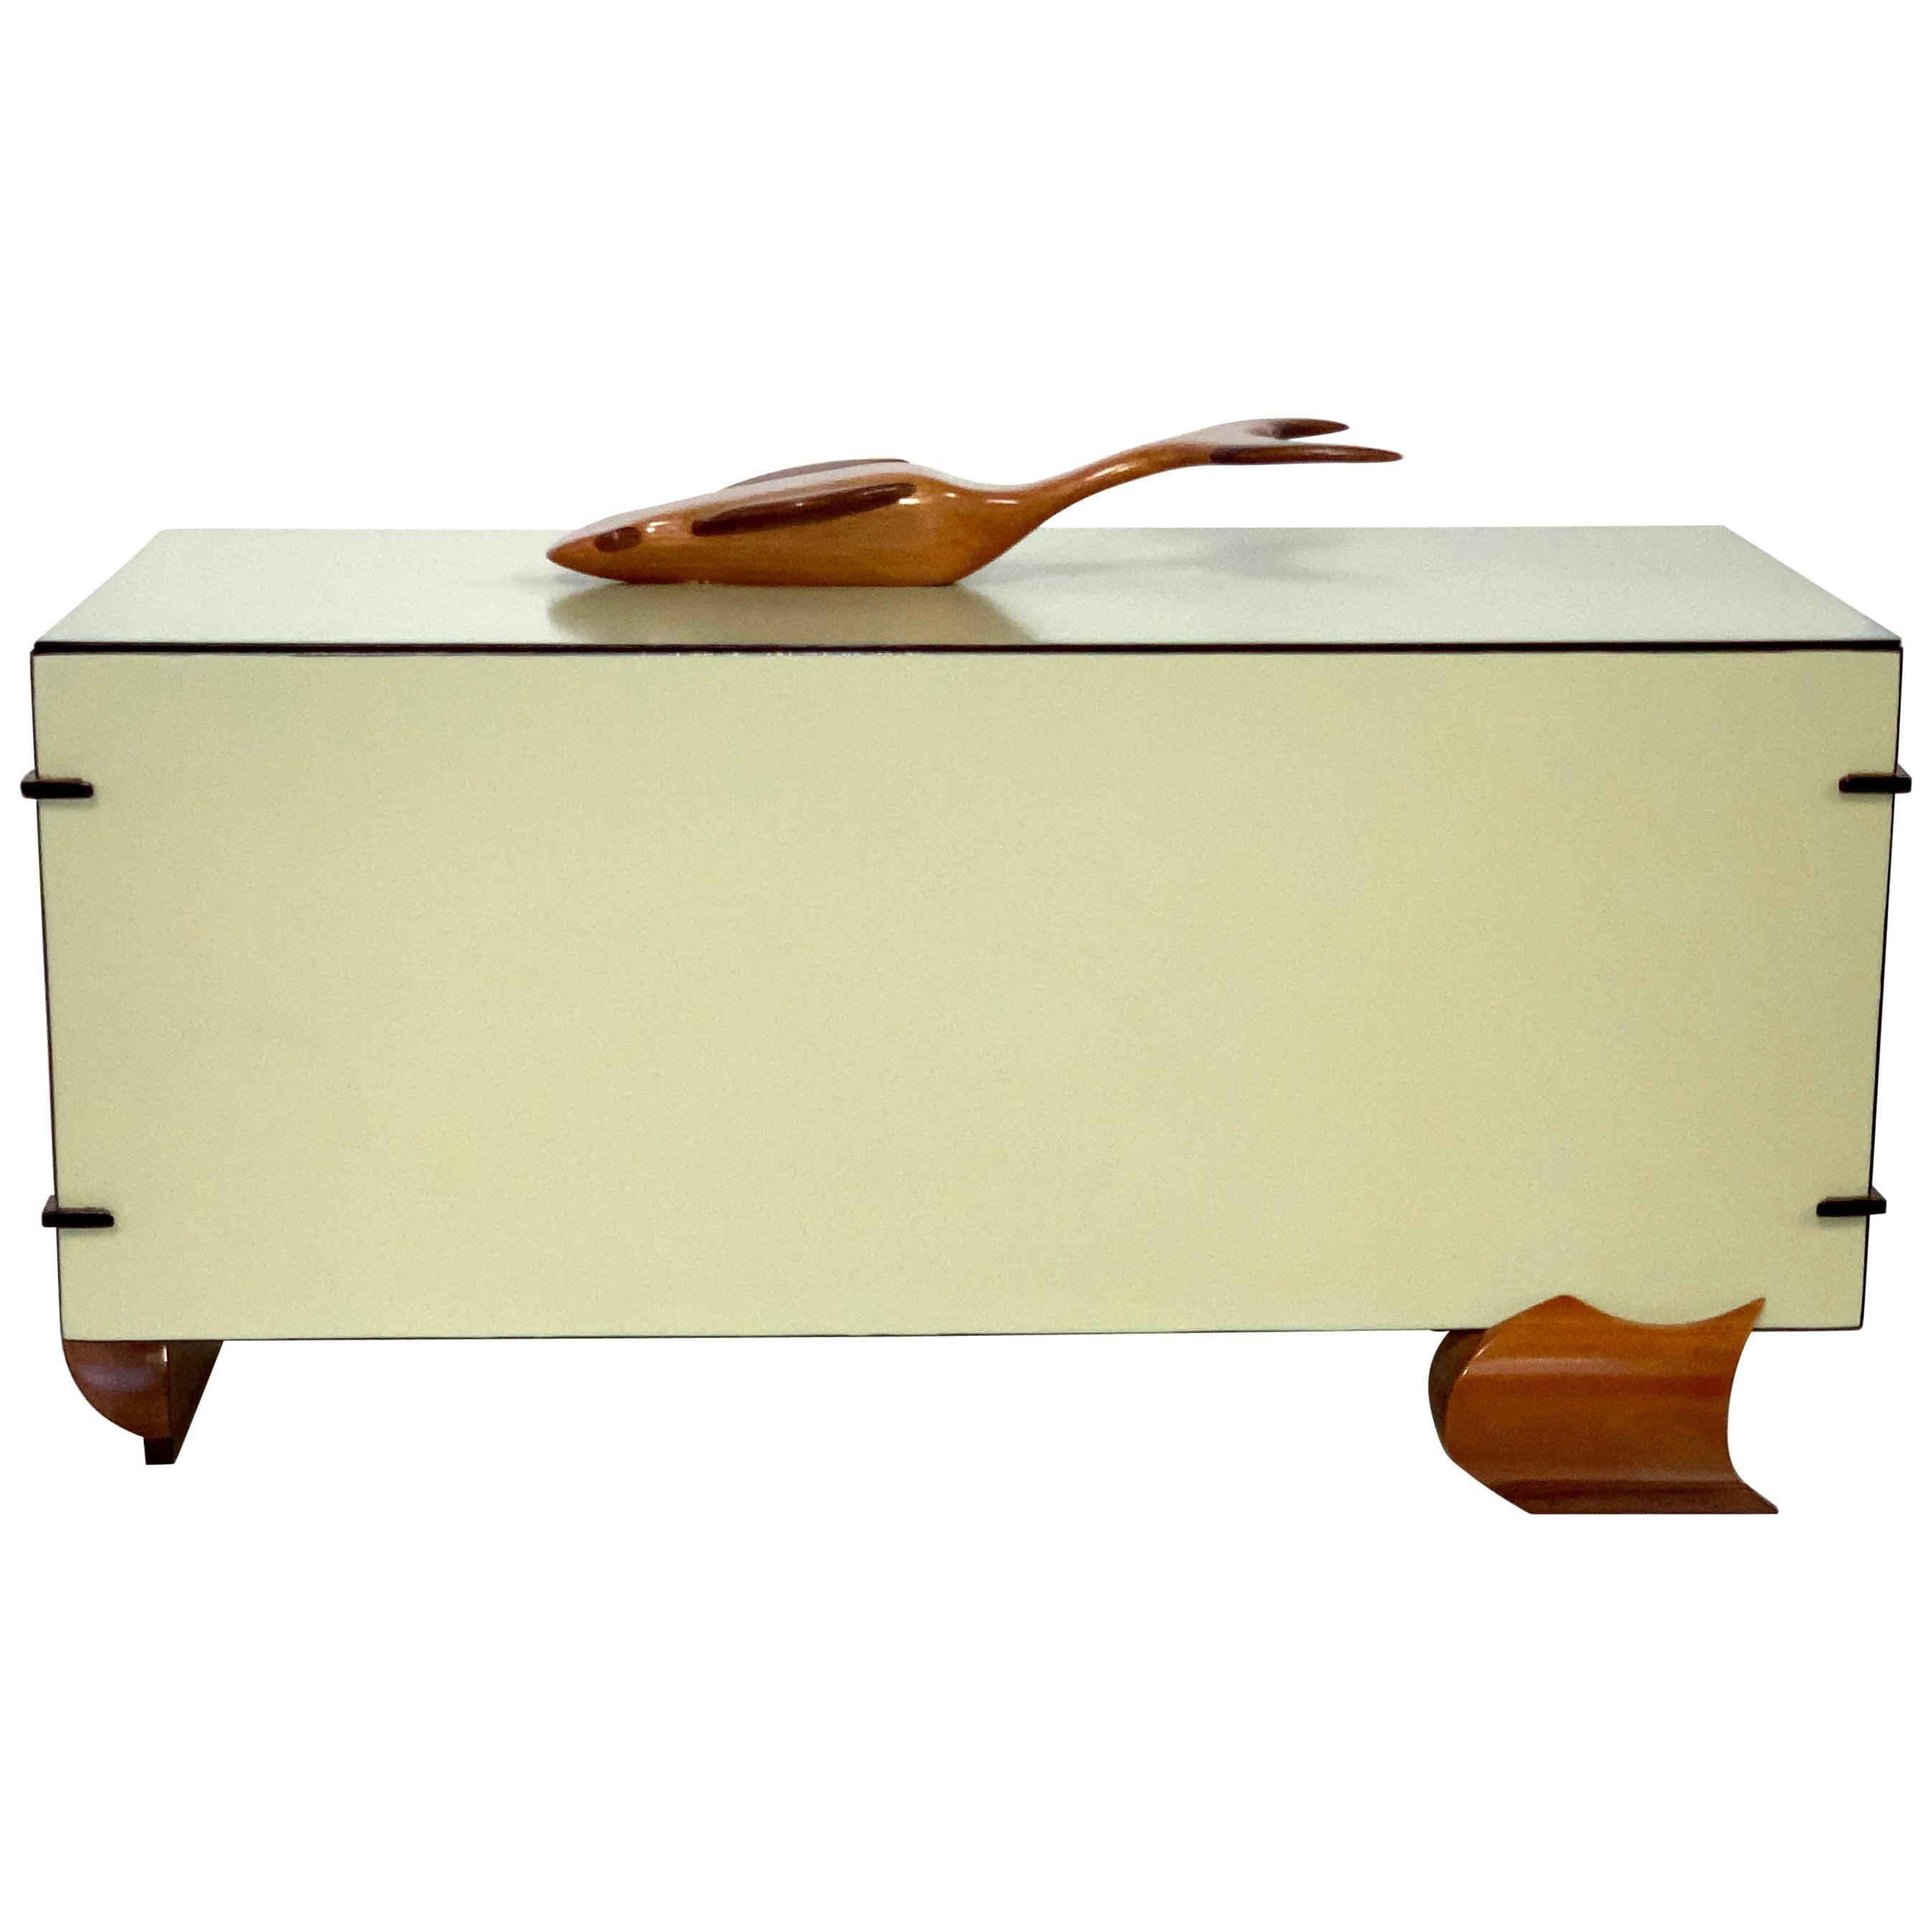 Artisan Craftsman Whale Top Box